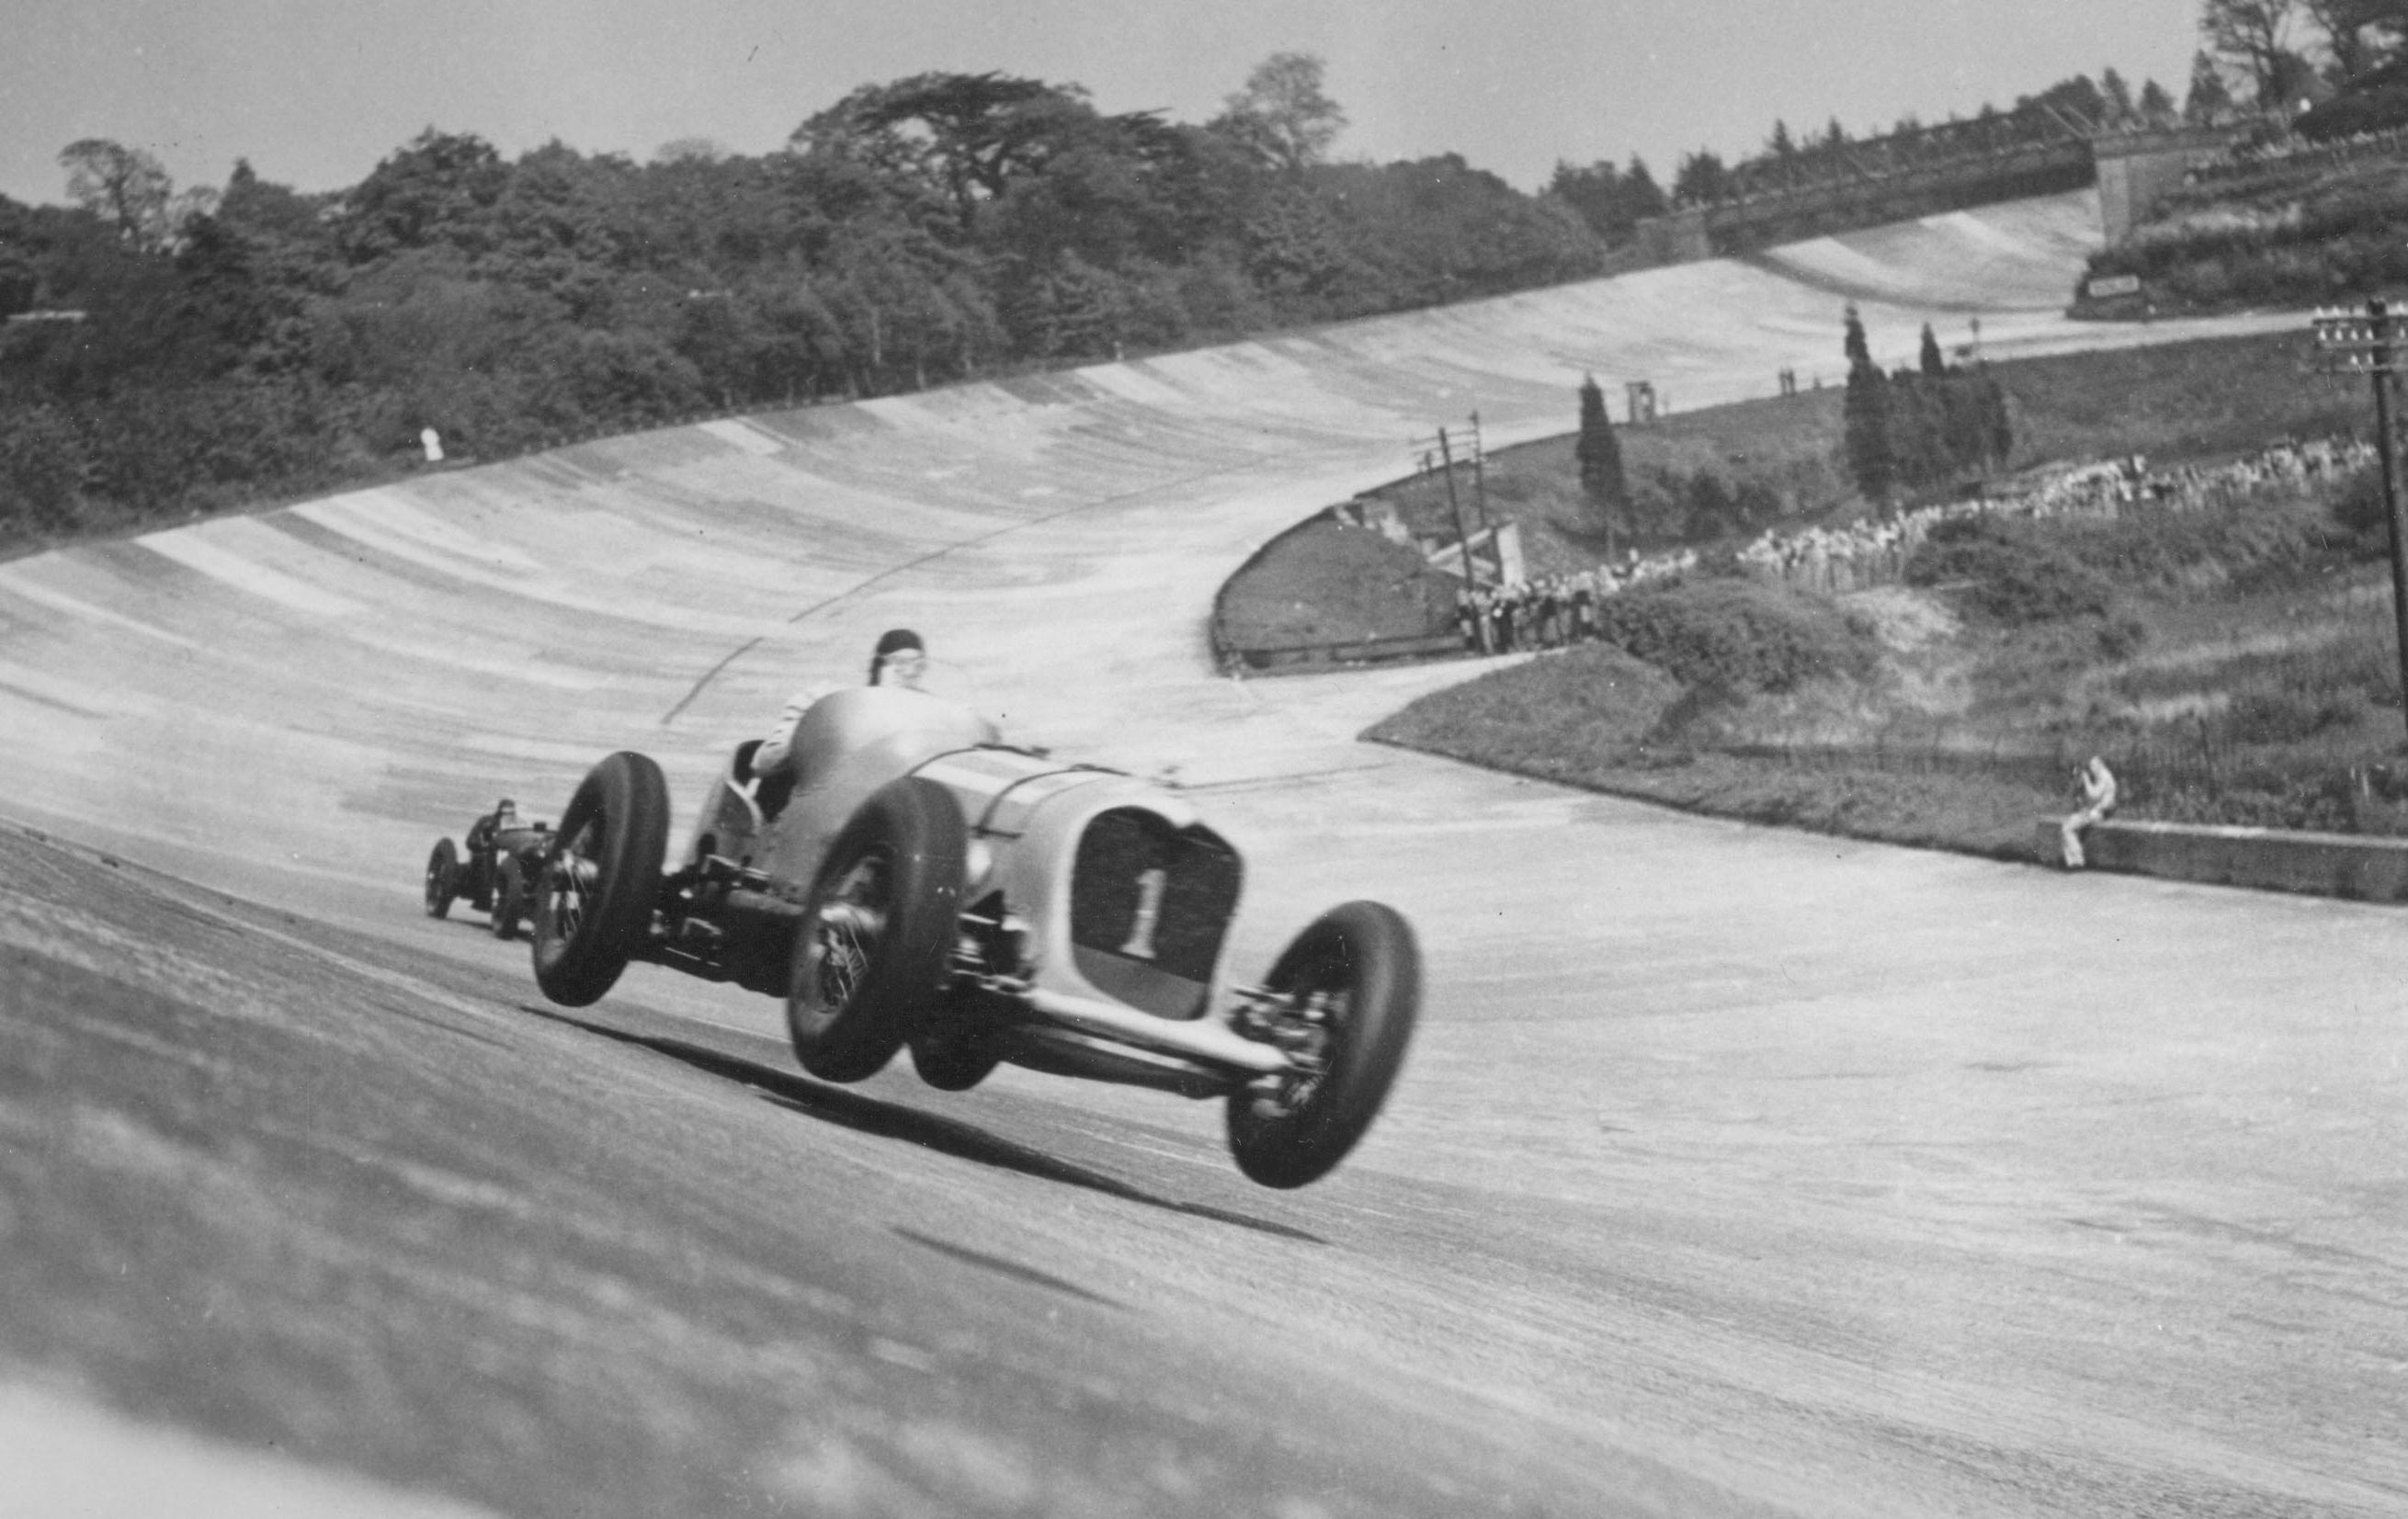 John Cobb drives the Napier_Railton on a record run at Brooklands